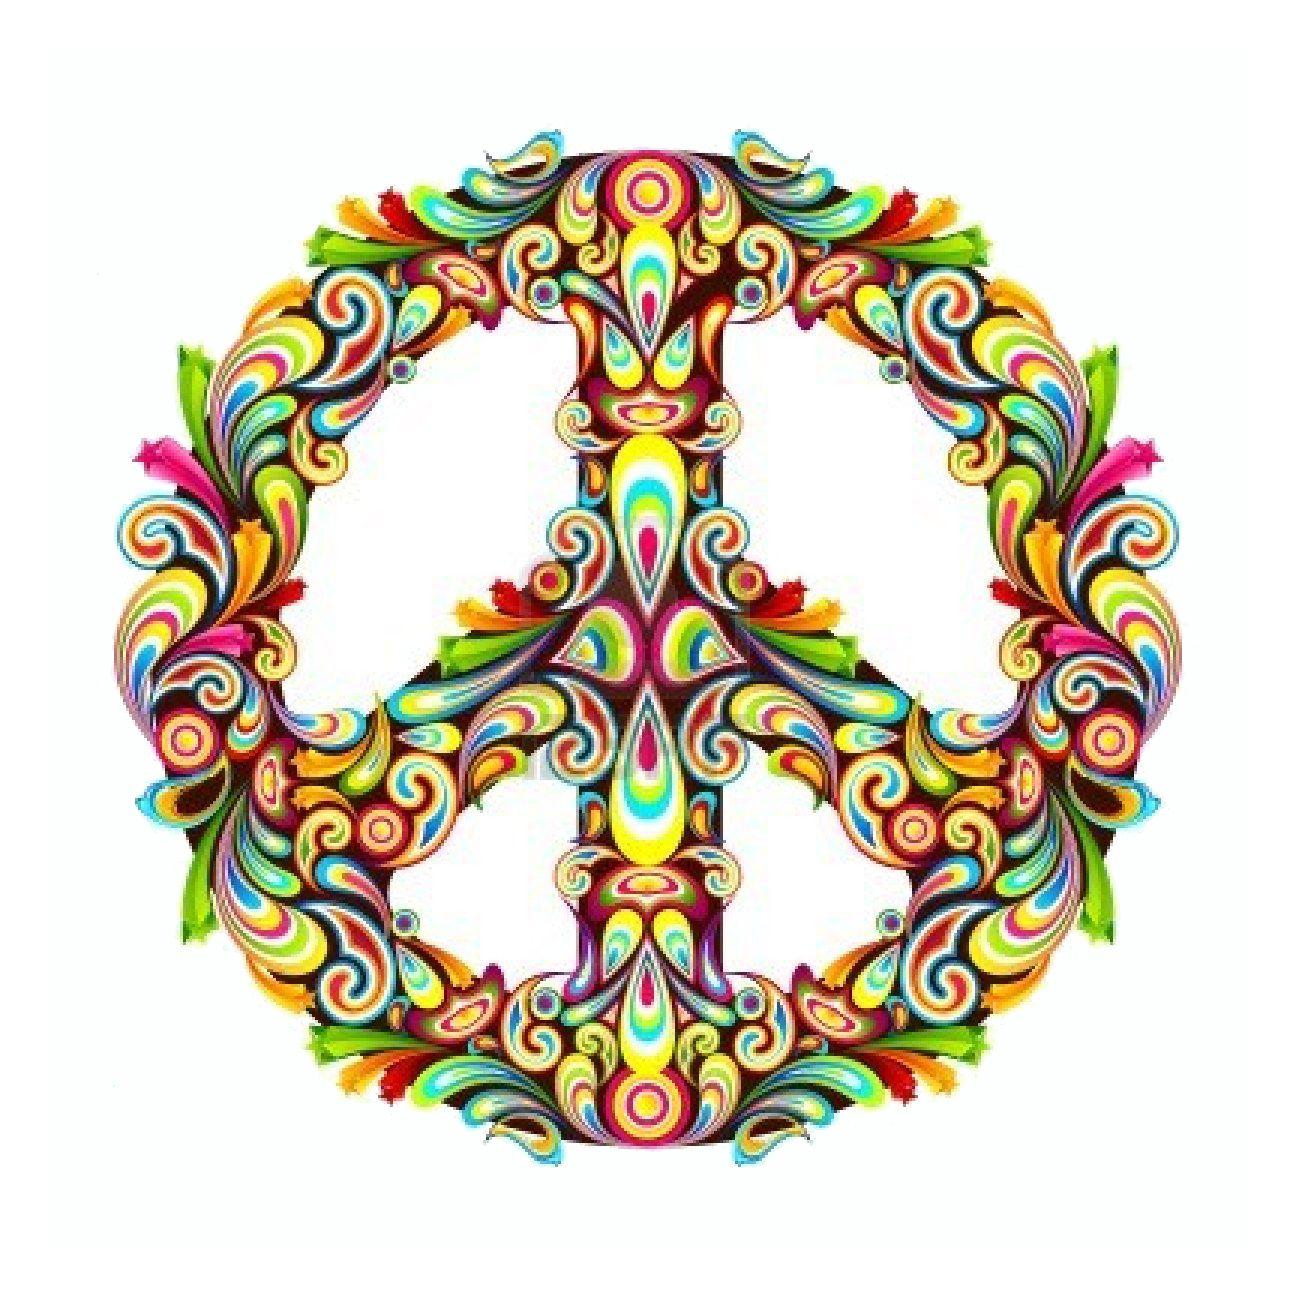 Peace blogs world peace through technology ceramics peace blogs world peace through technology buycottarizona Gallery